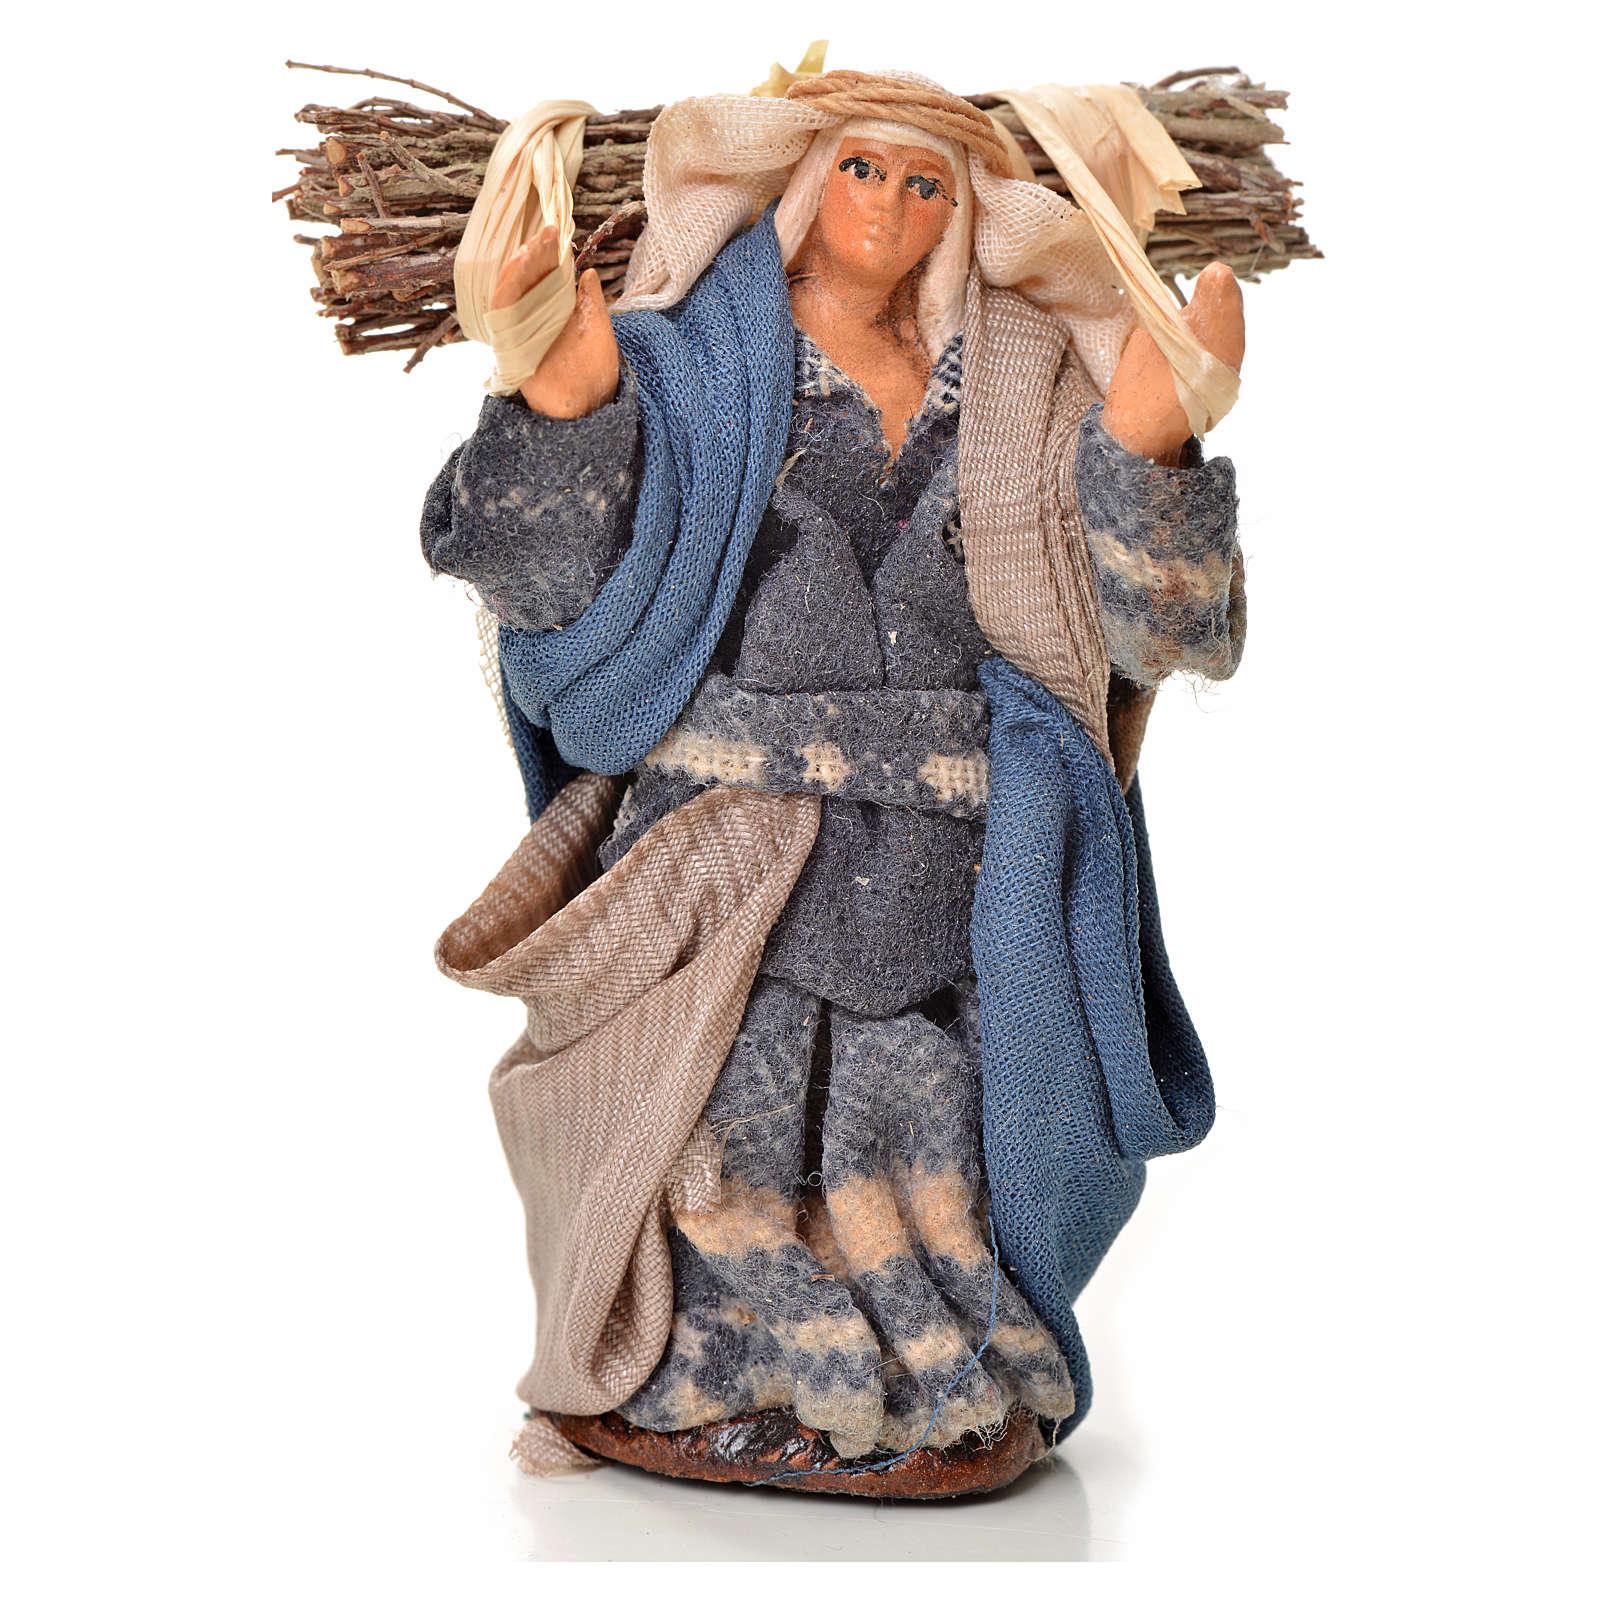 Neapolitan Nativity figurine, woman with bundle, 6 cm 4